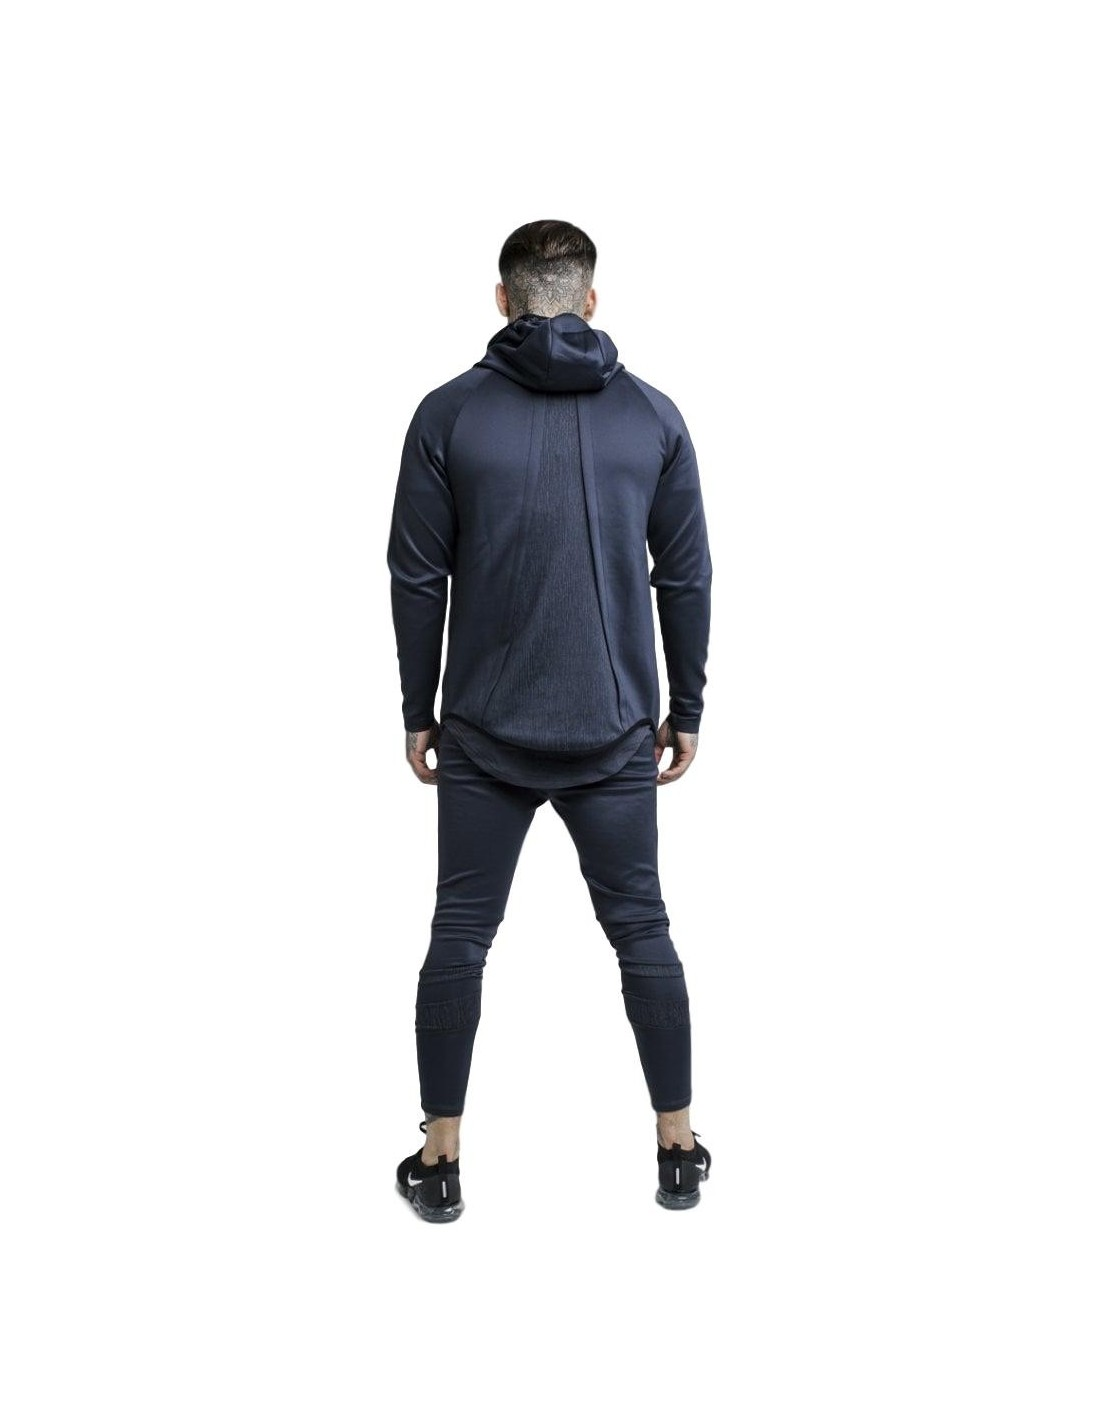 Sweatshirt SikSilk Hoodie With Sprint To Urban Green